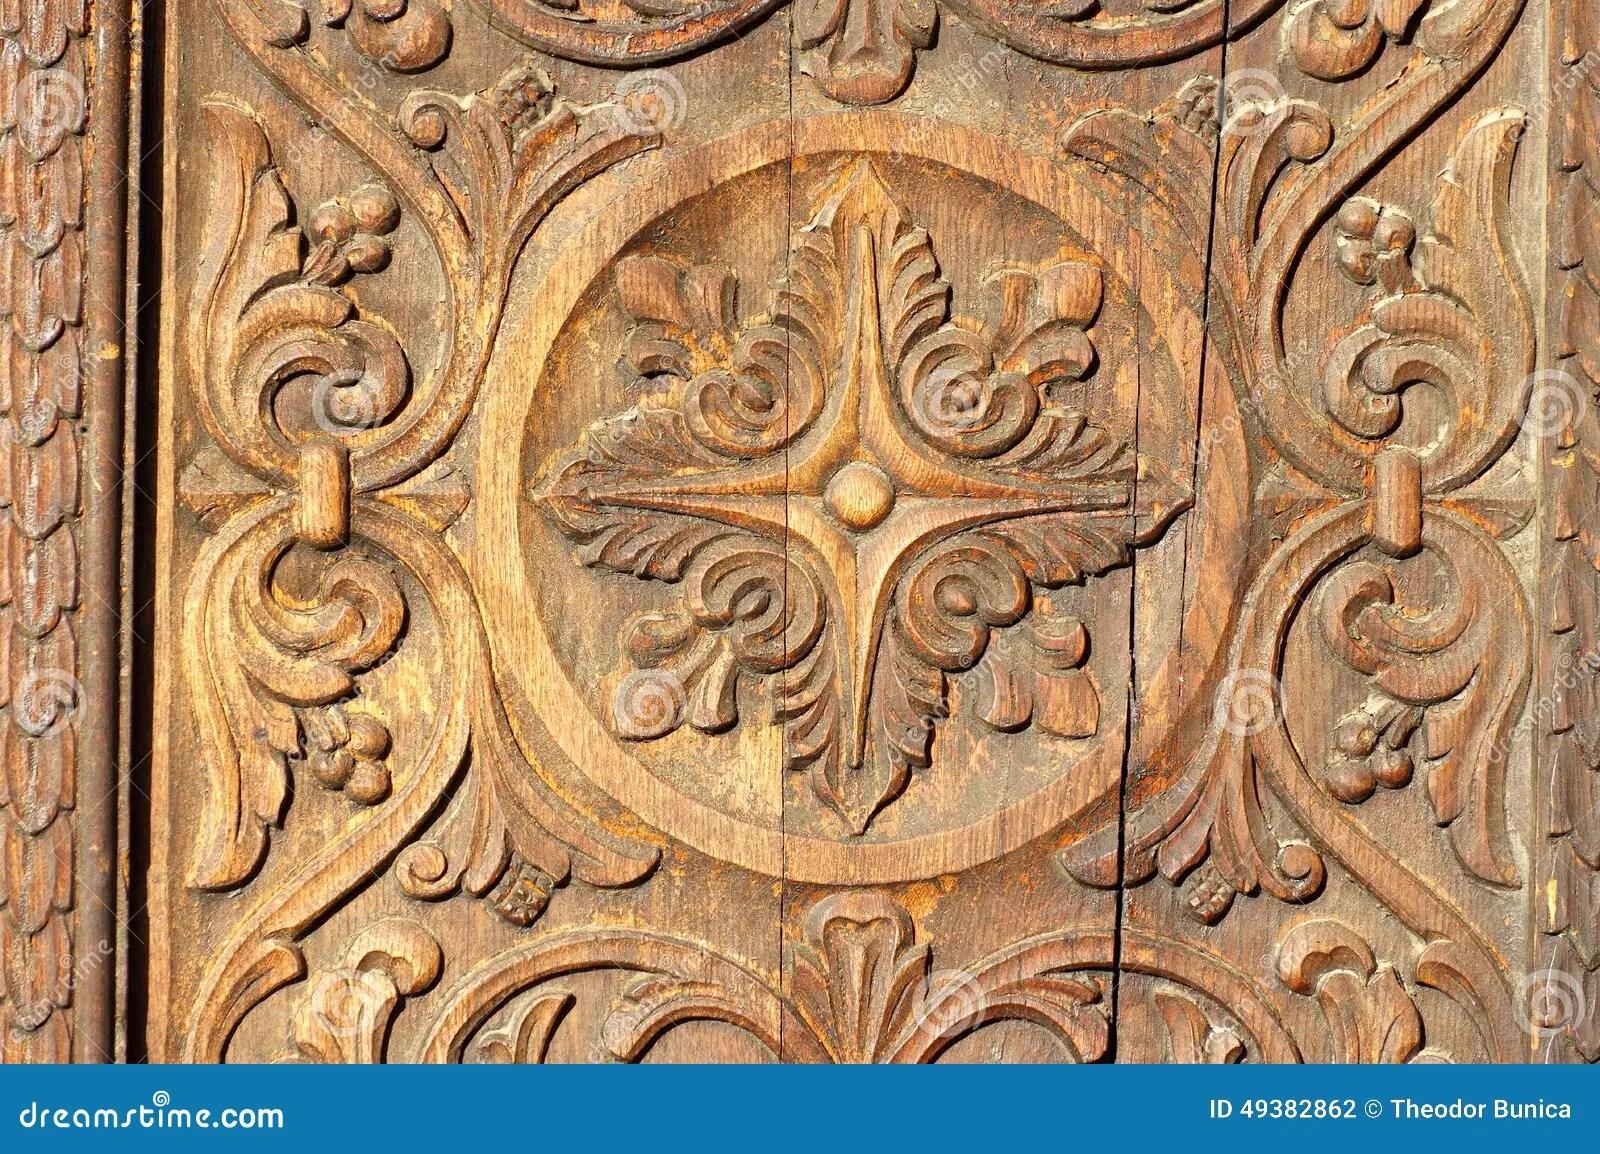 Islamic Wallpaper Hd Download Full Bas Relief In Wood Carved Wooden Door Wooden Background